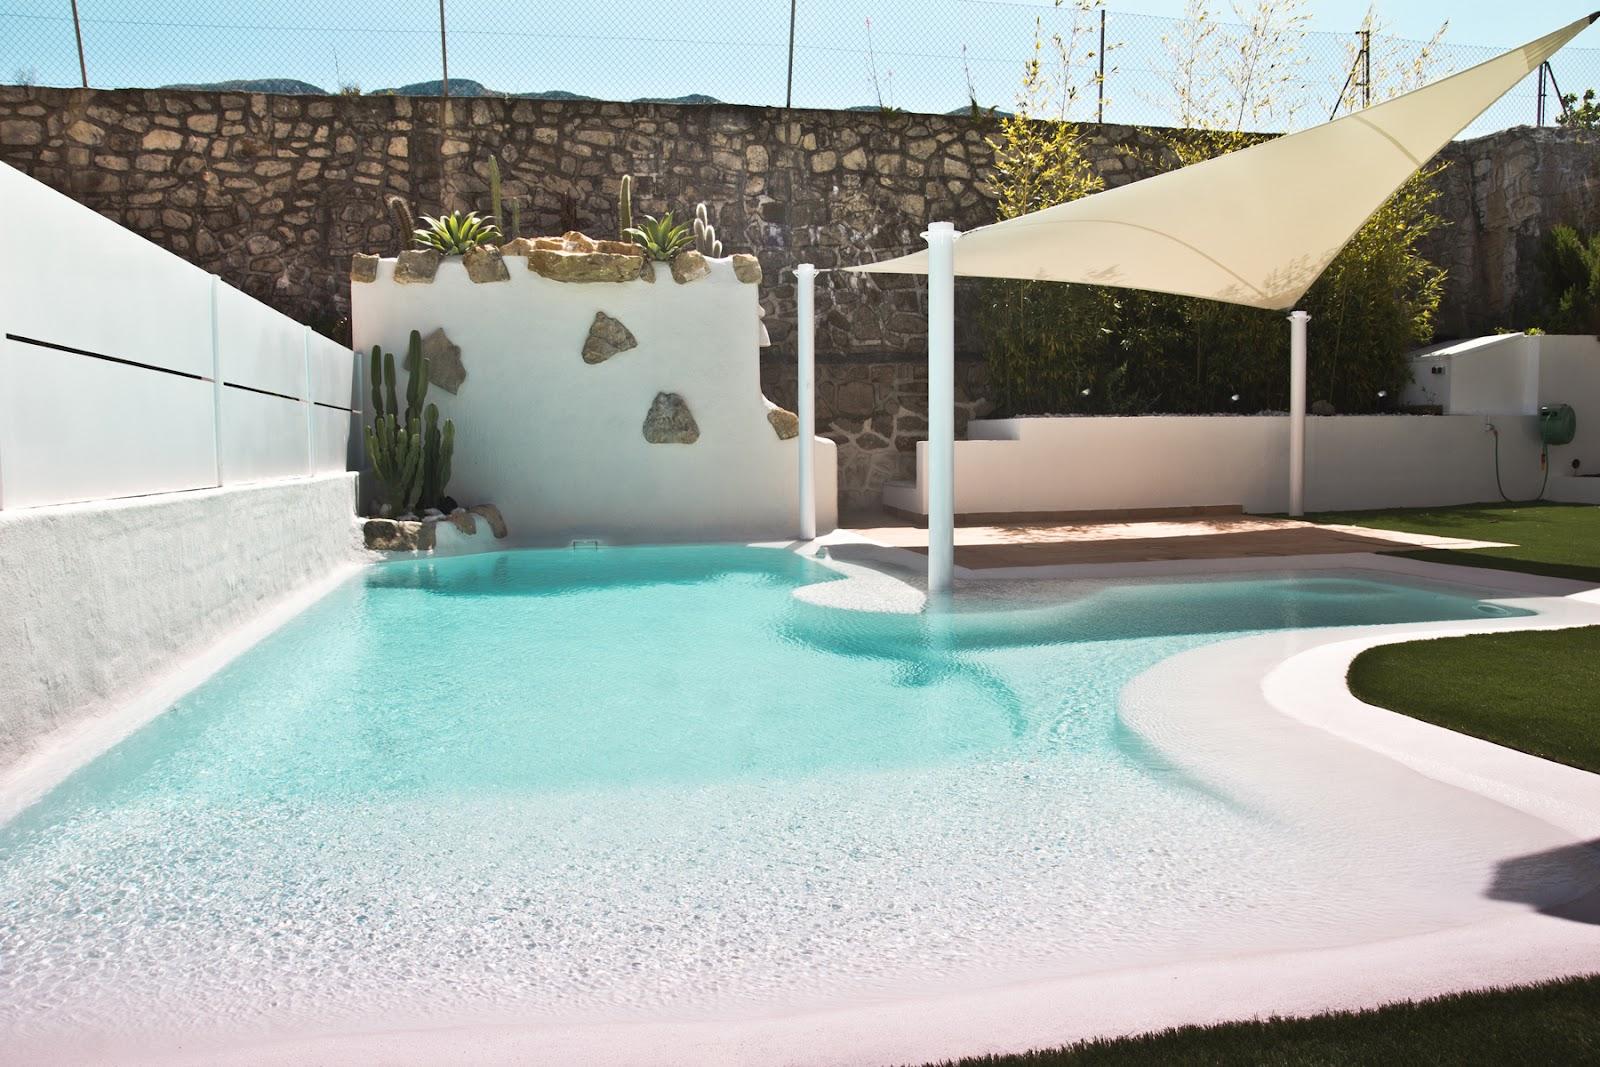 Fase final concurso ipool2012 a la mejor piscina de for Gunitec piscinas